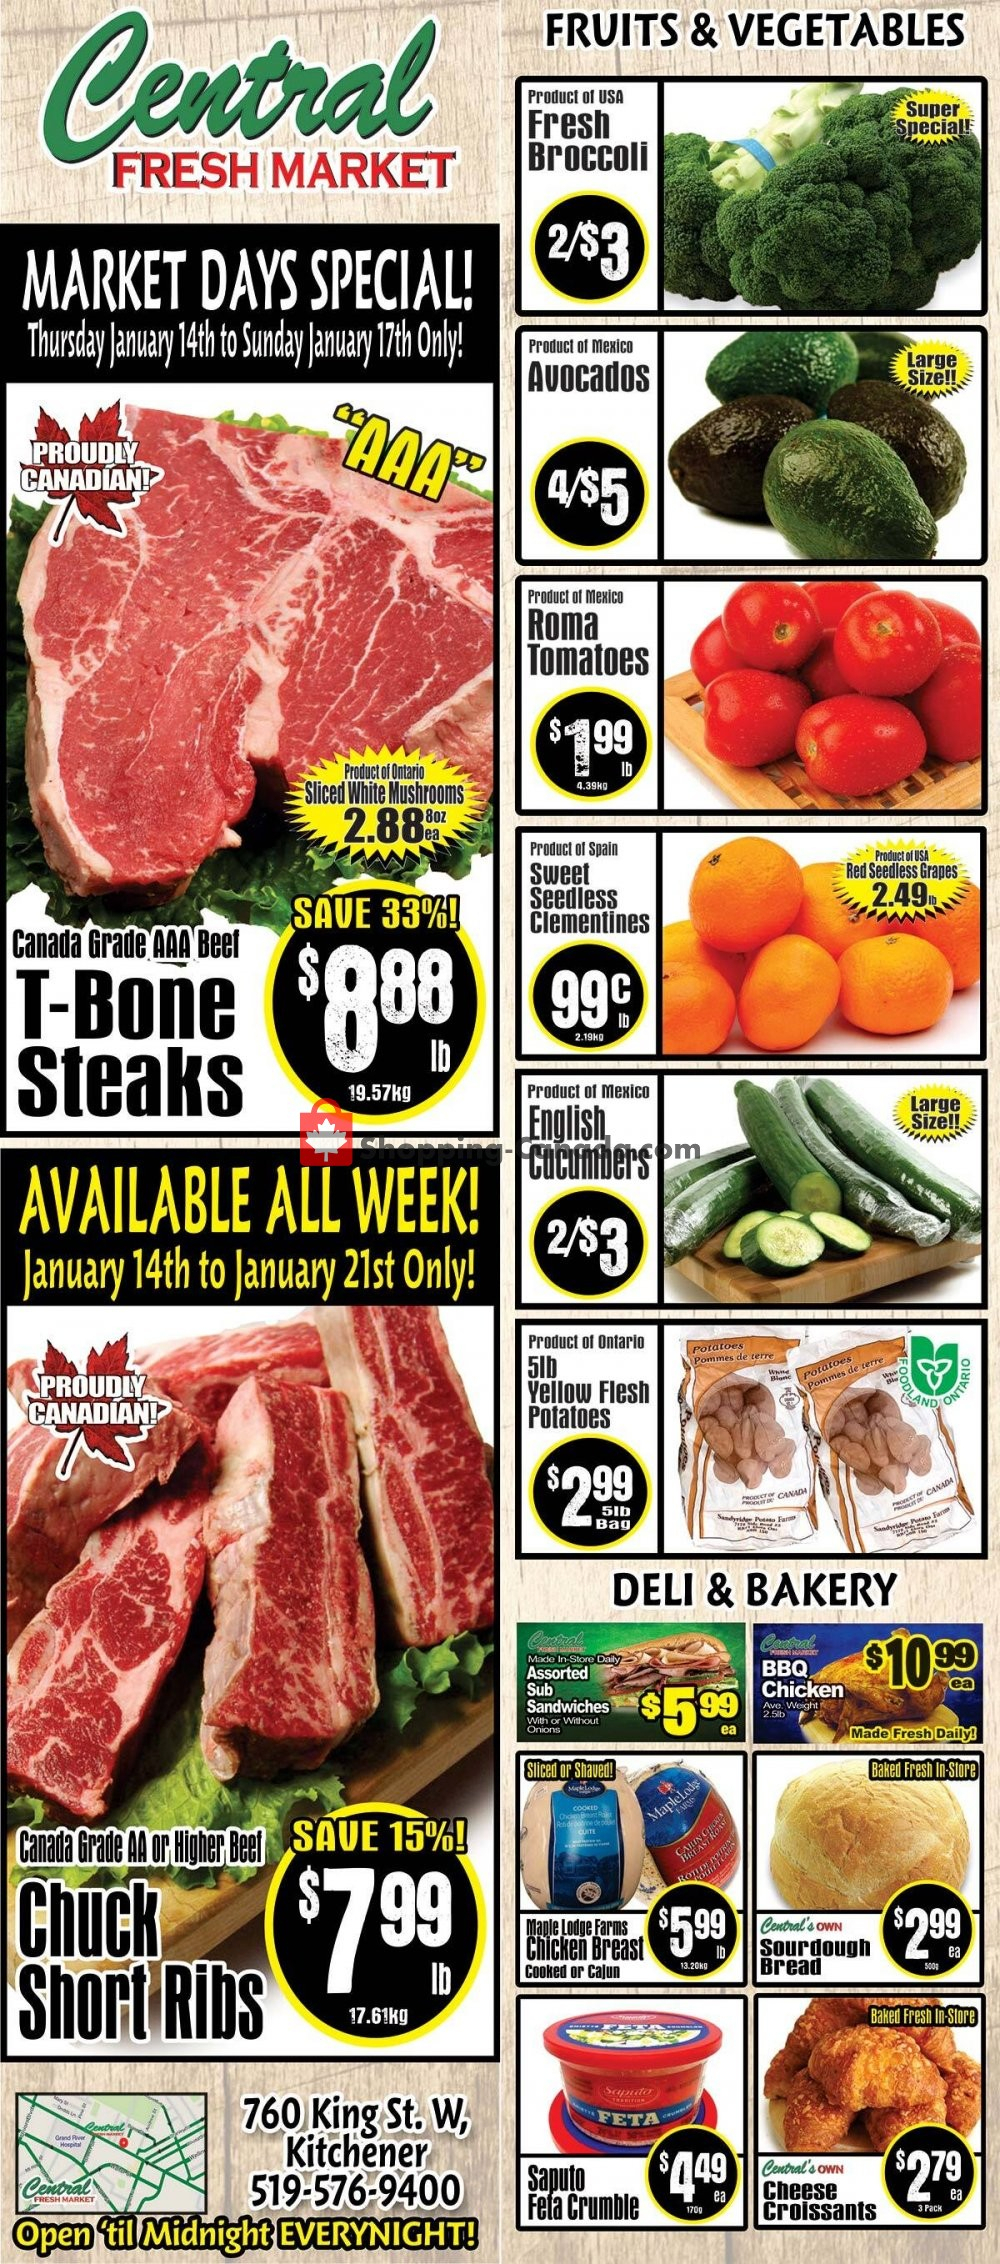 Central Fresh Market Canada, Flyer - (Market Days Special): January 14 - January 21, 2021